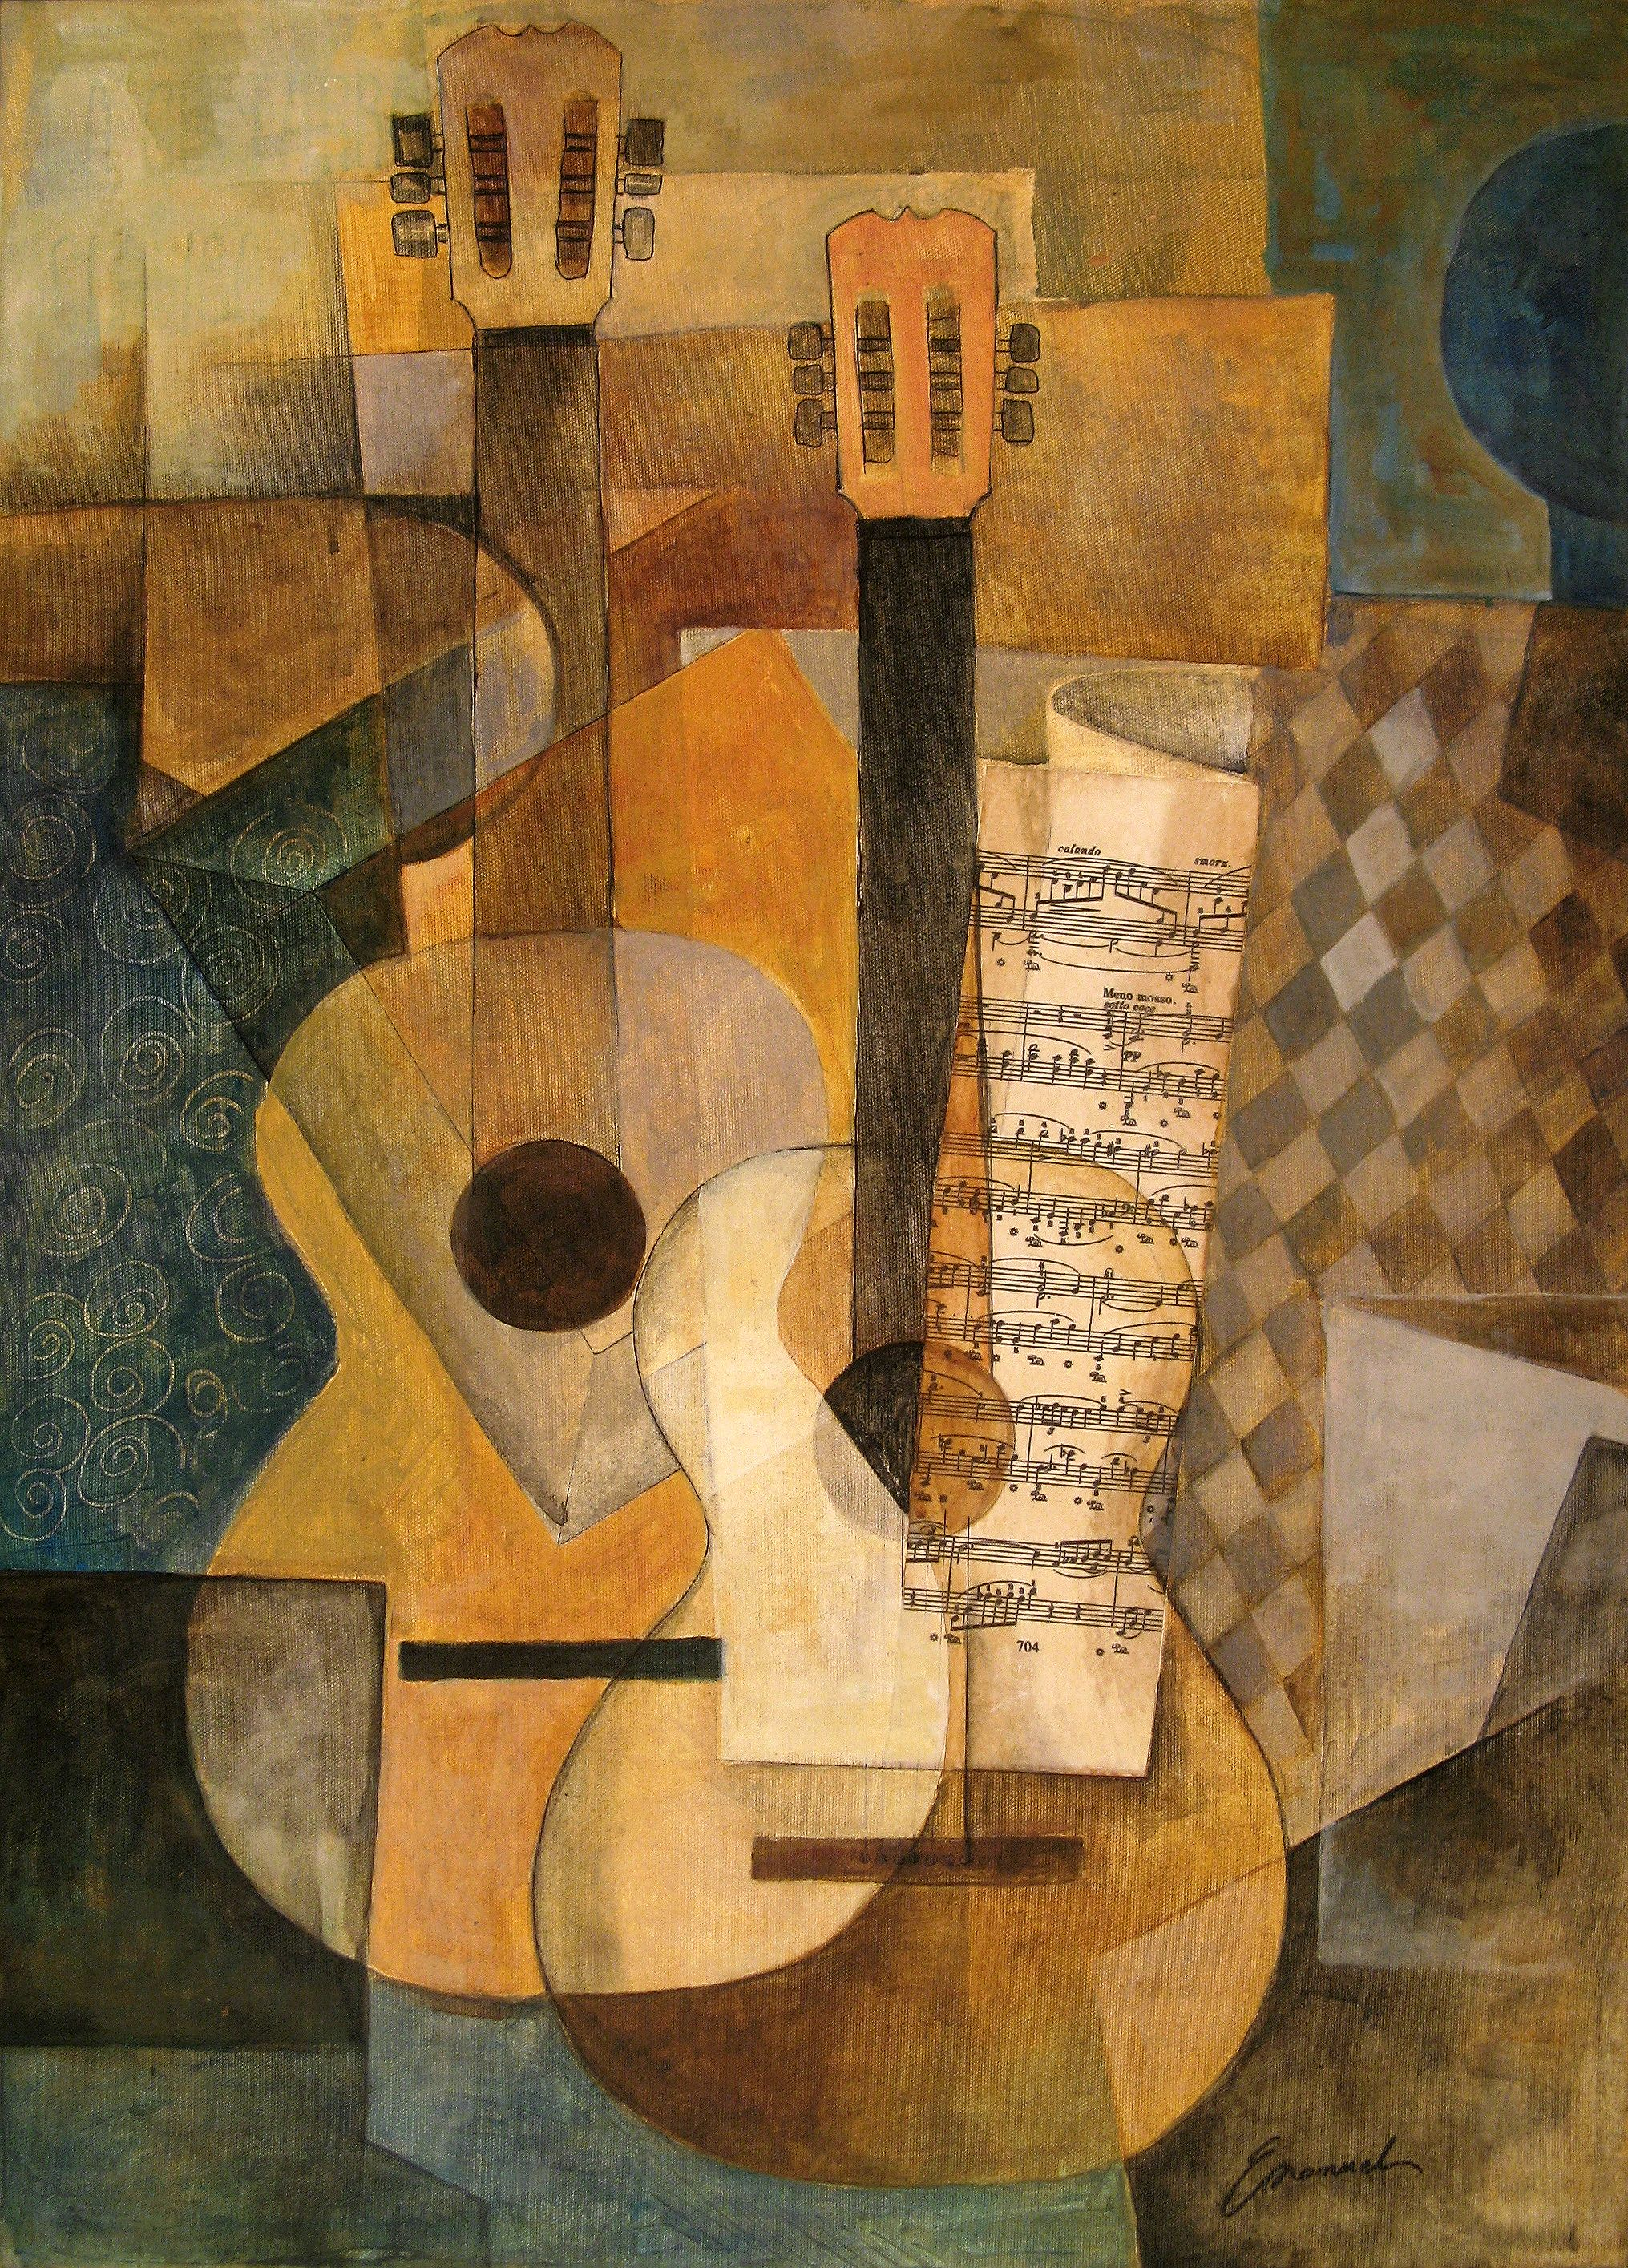 la guitarra original cubist painting by emanuel ologeanu kubismus abstrakte kunst und textur. Black Bedroom Furniture Sets. Home Design Ideas